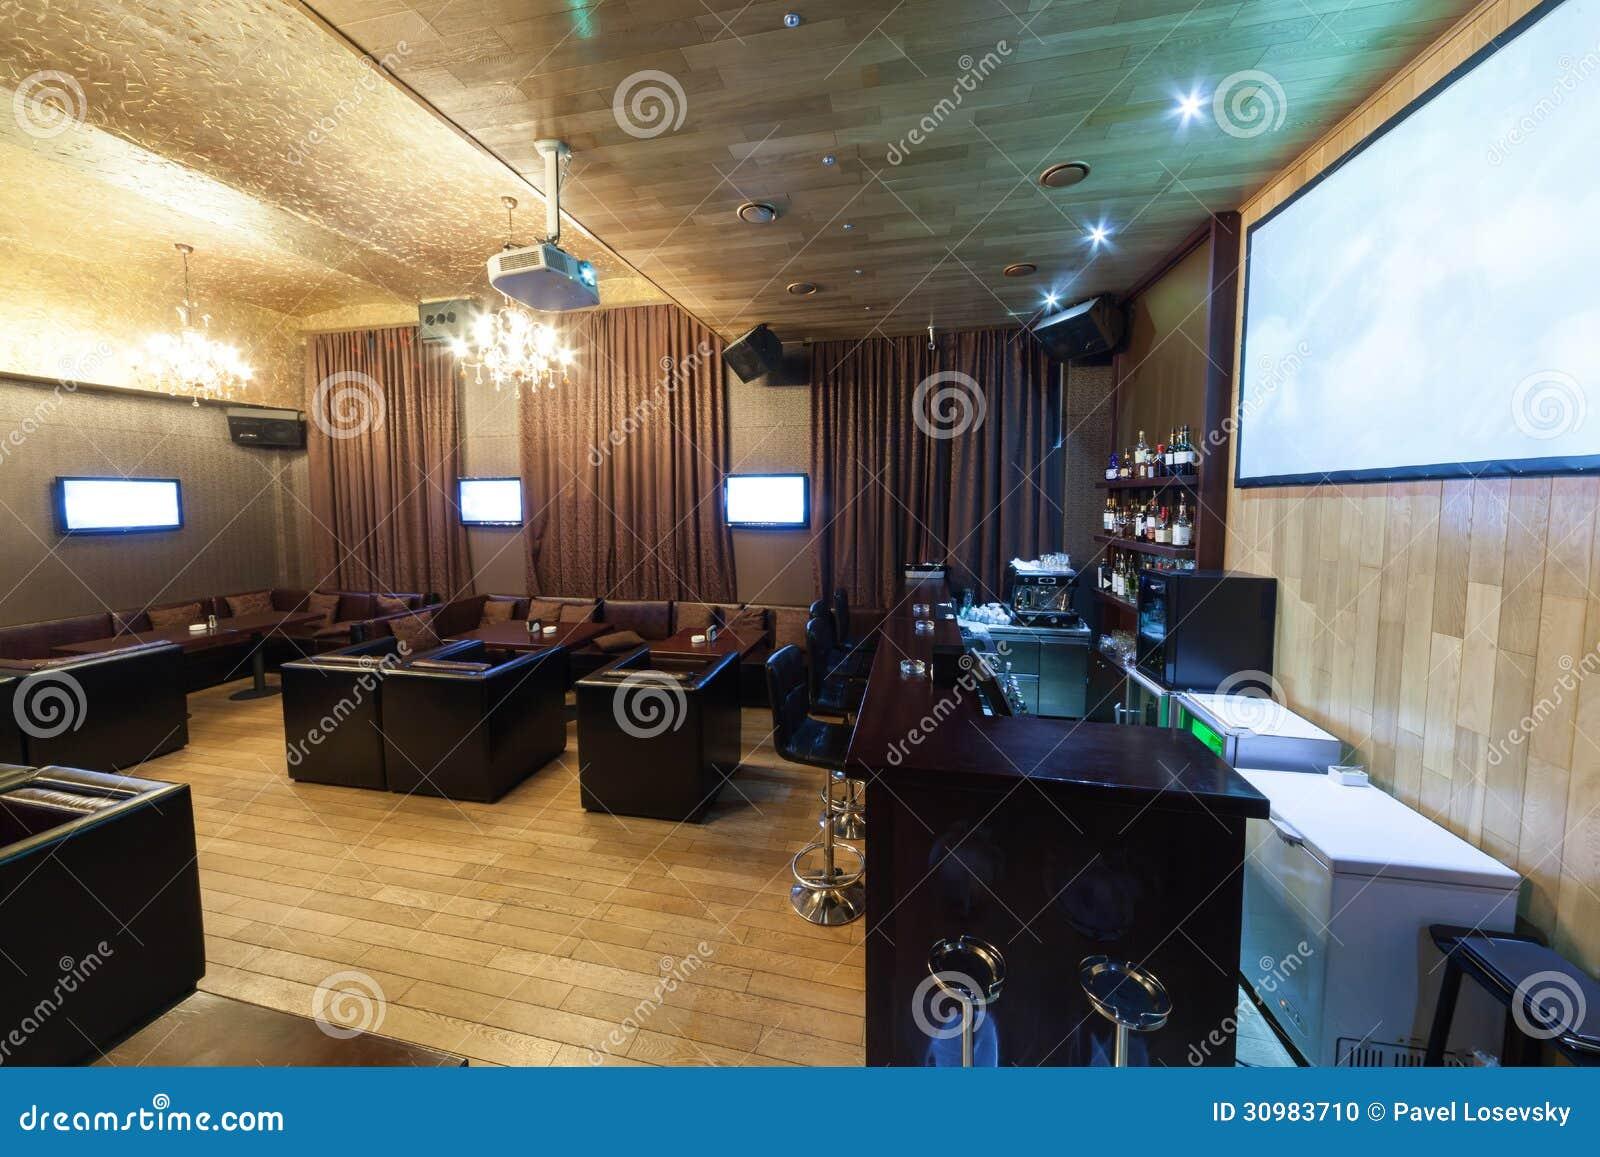 Stylish interior of karaoke bar stock photo image 30983710 for Interior leather bar